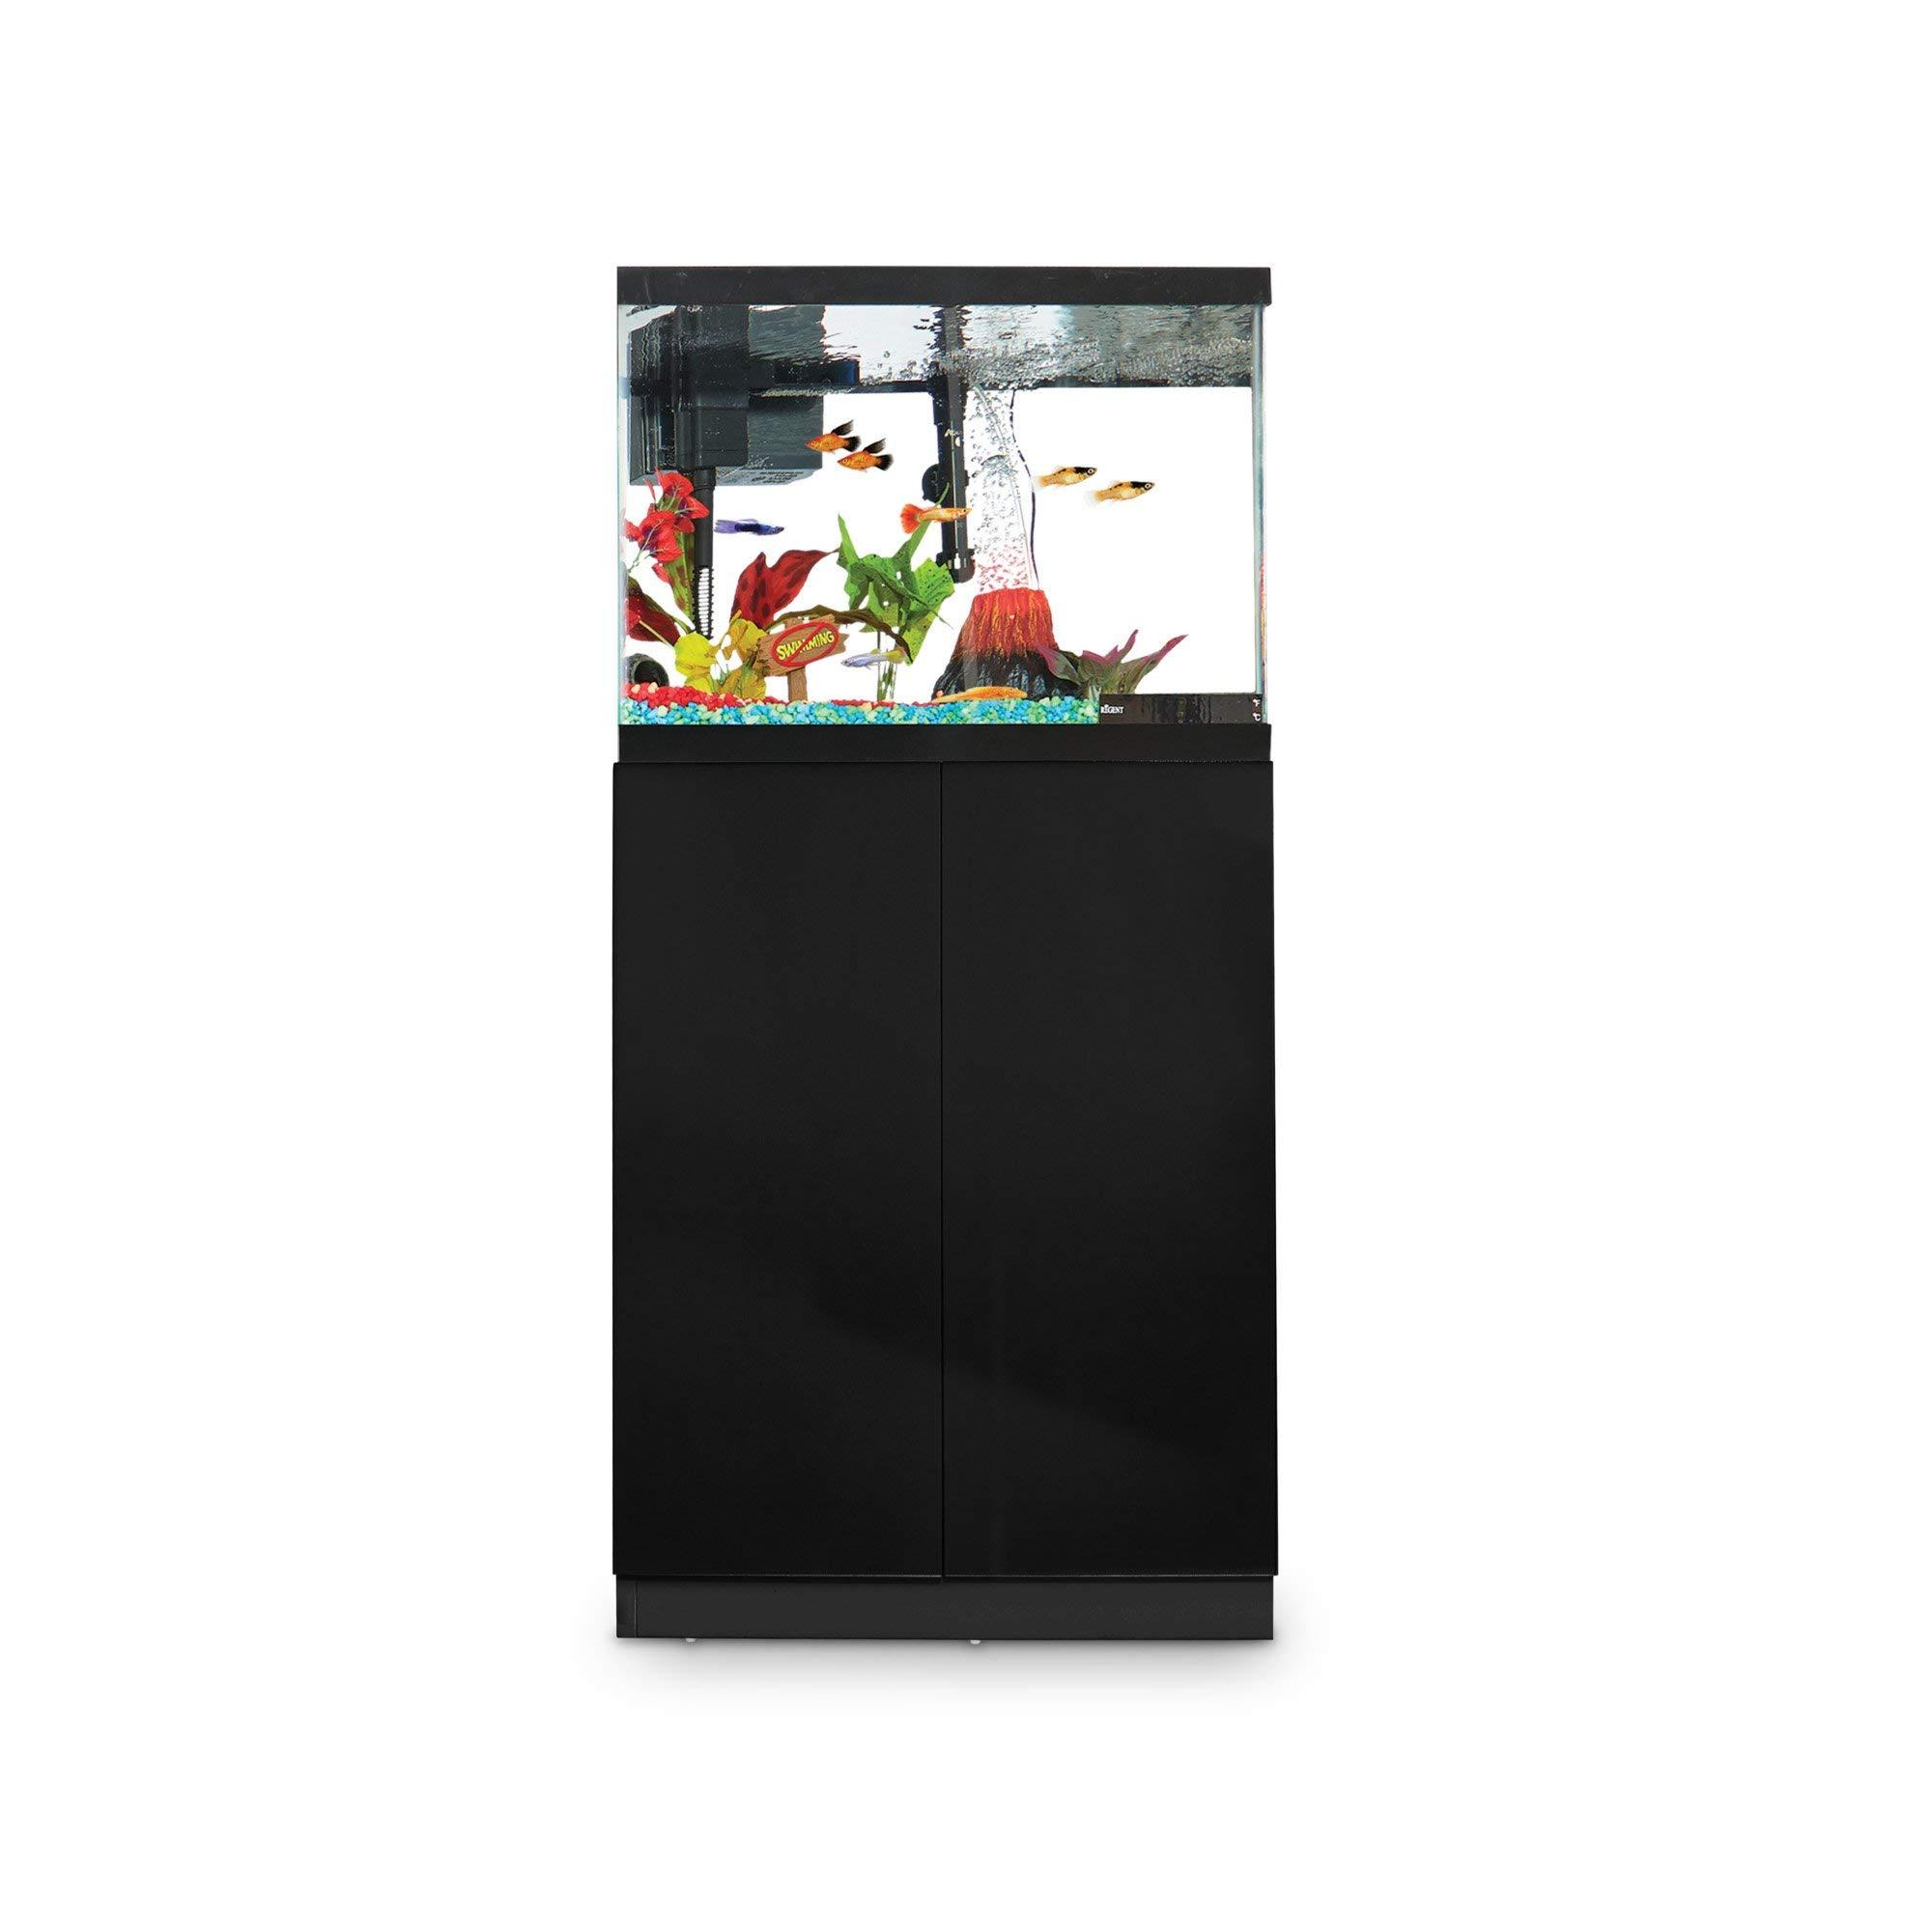 Imagitarium Black Gloss Fish Tank Stand, Up to 20 Gal, 12.5 in by Imagitarium